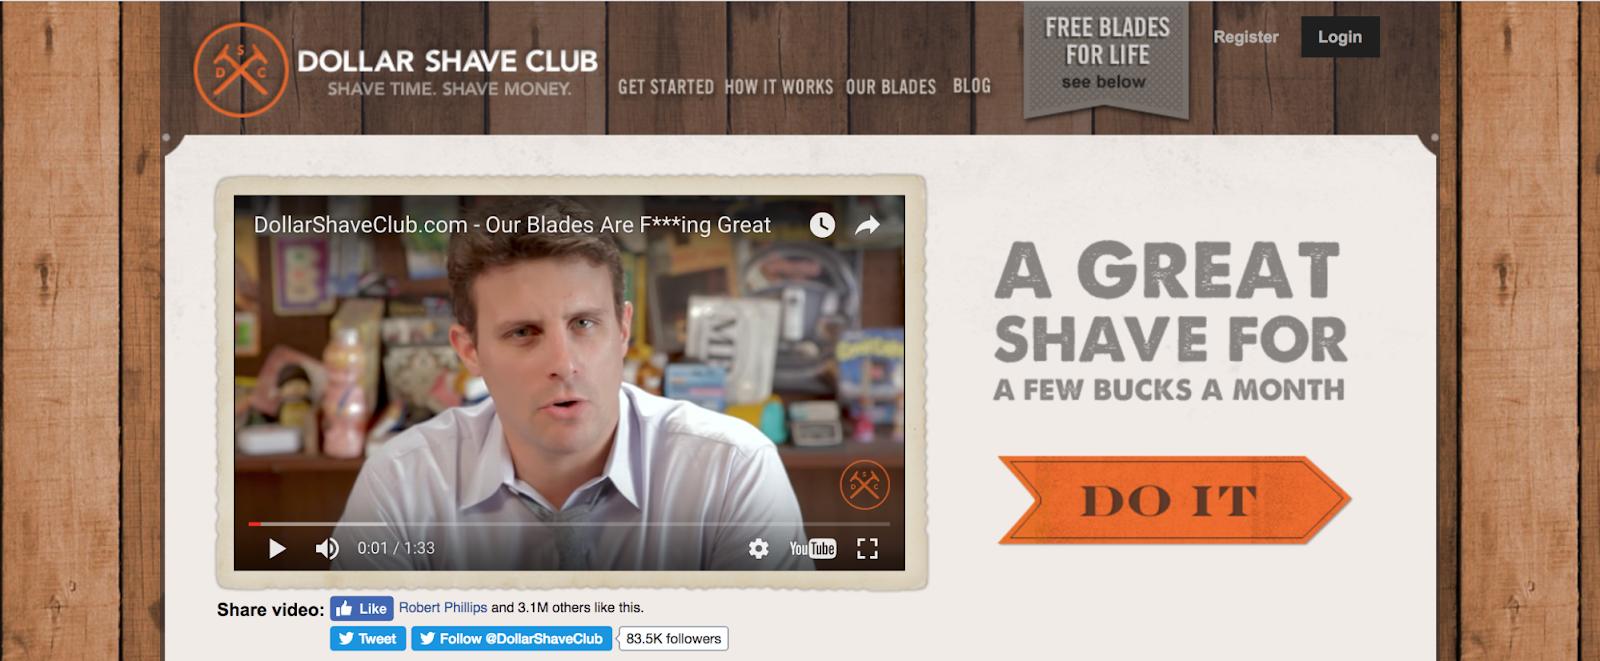 Screenshot showing Dollar Shave Club